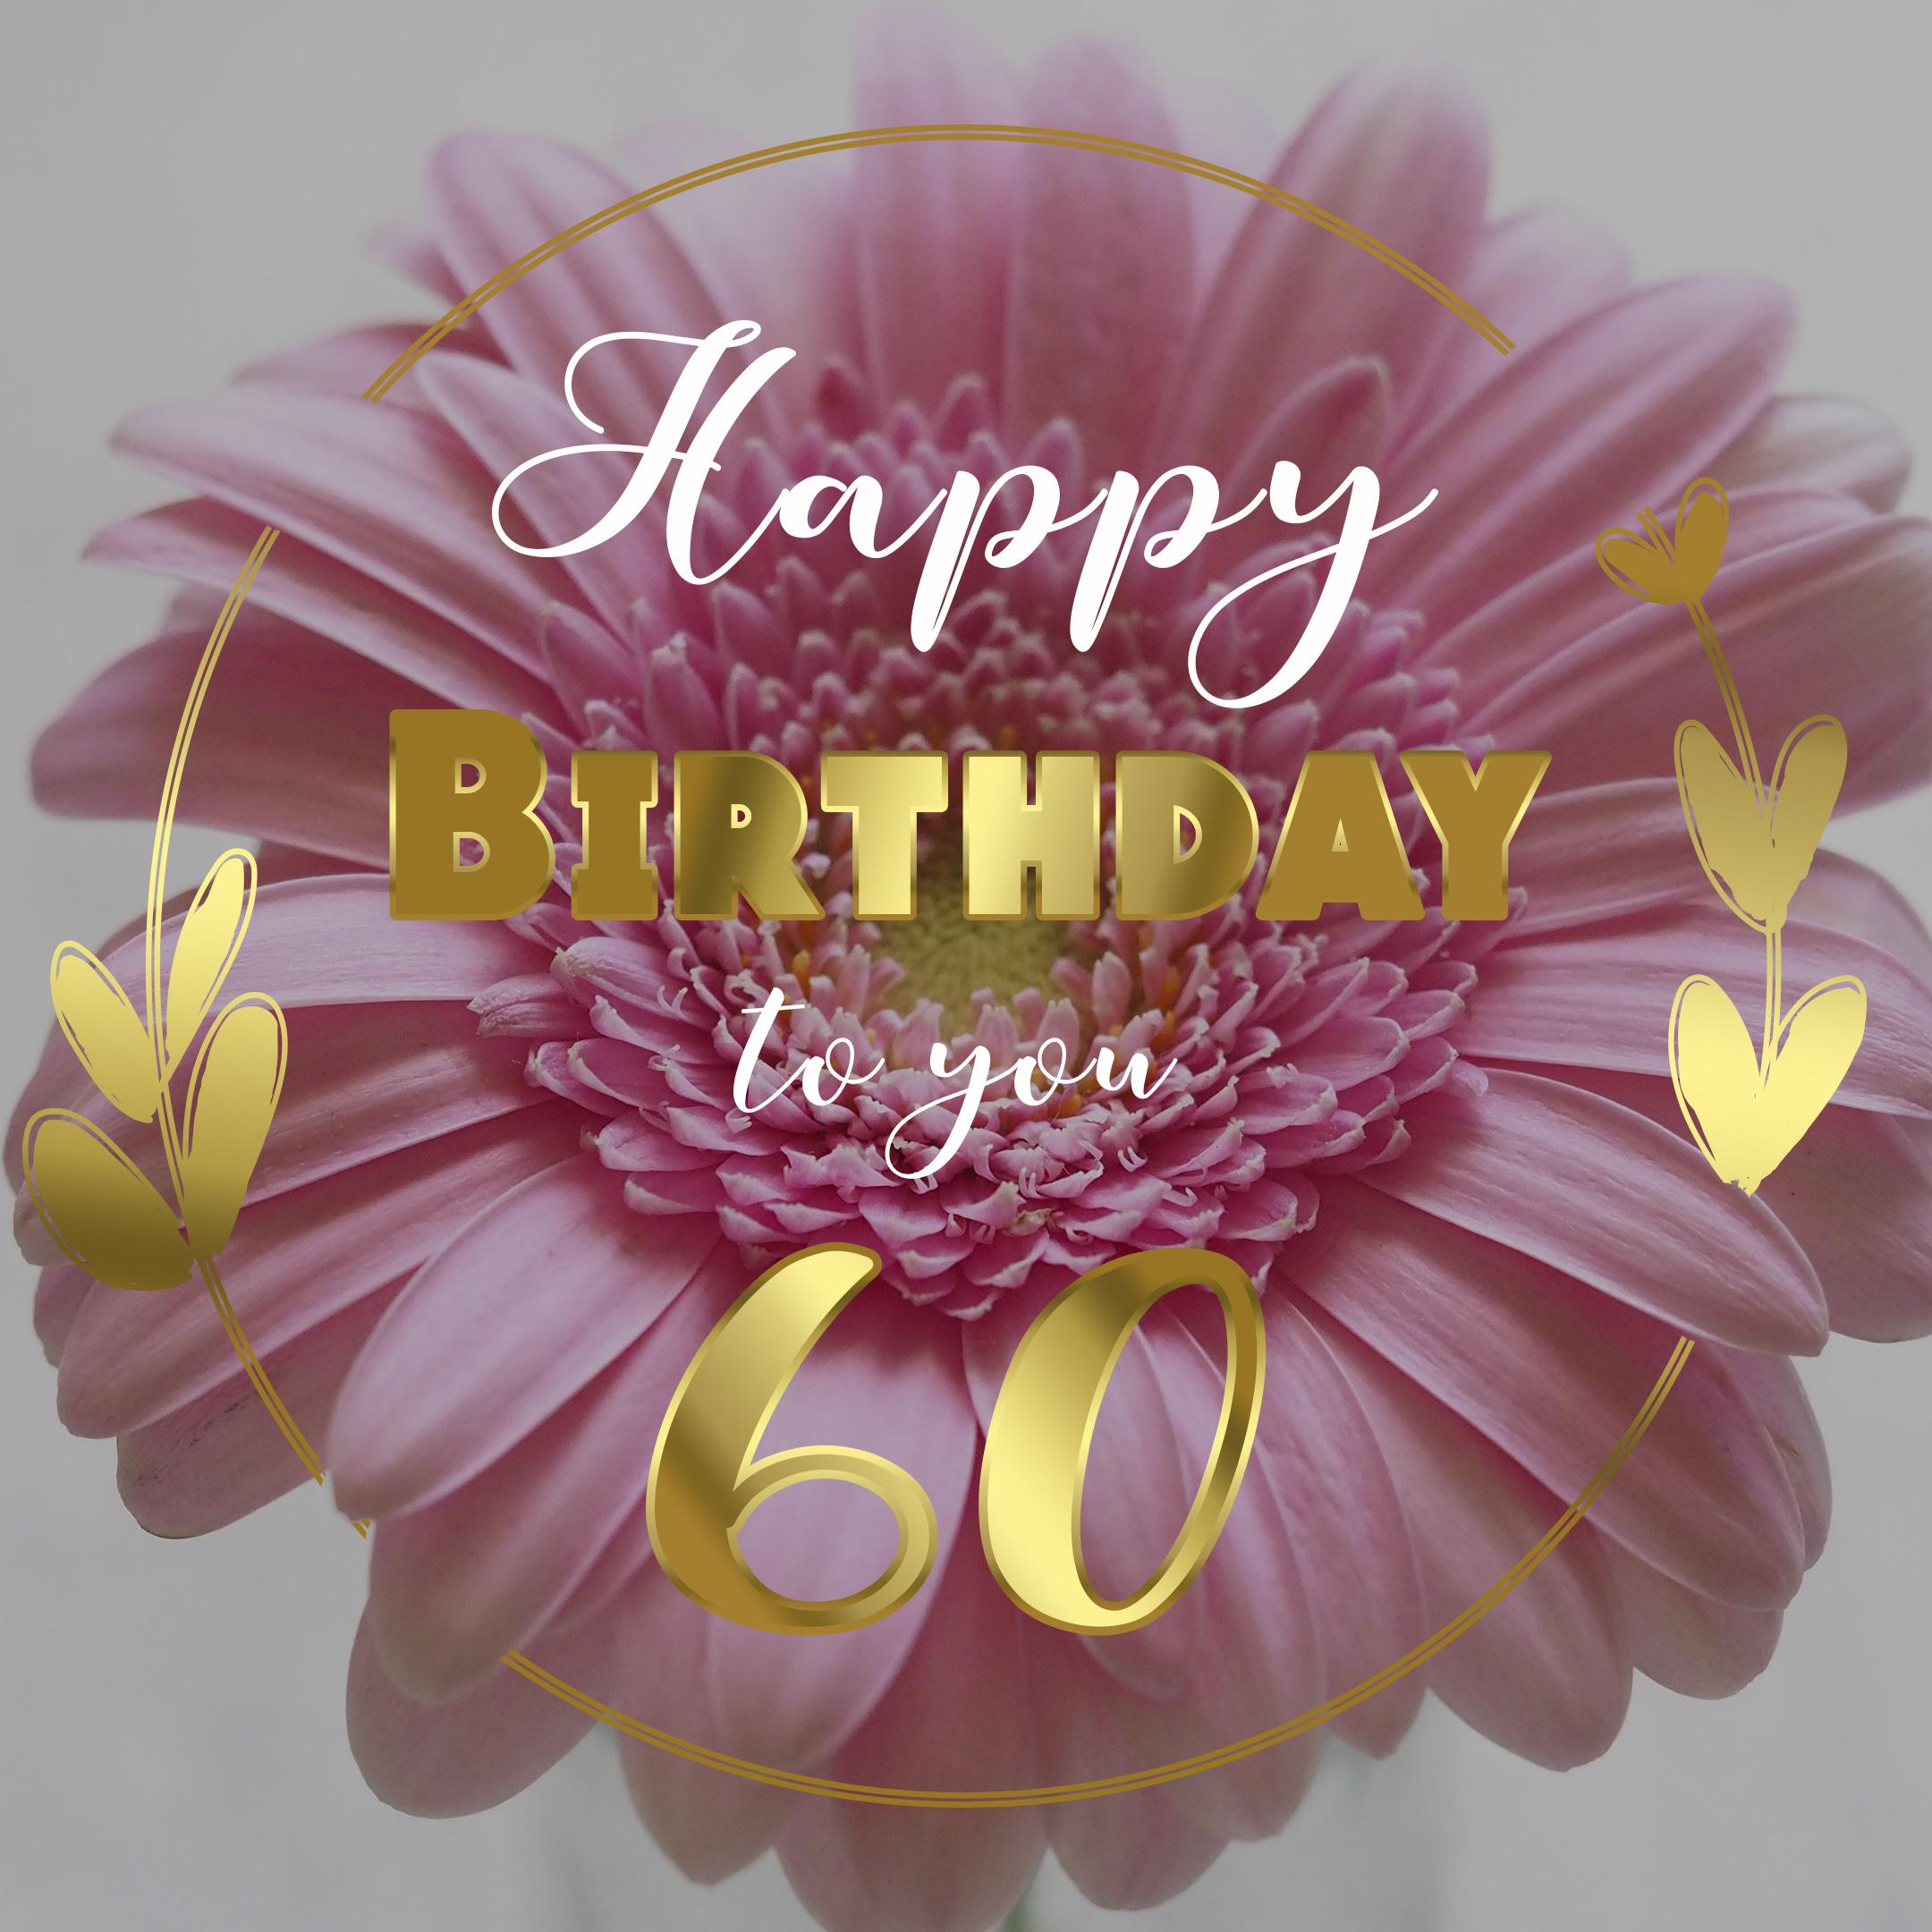 Free 60th Years Free Happy Birthday Image With Flower - birthdayimg.com